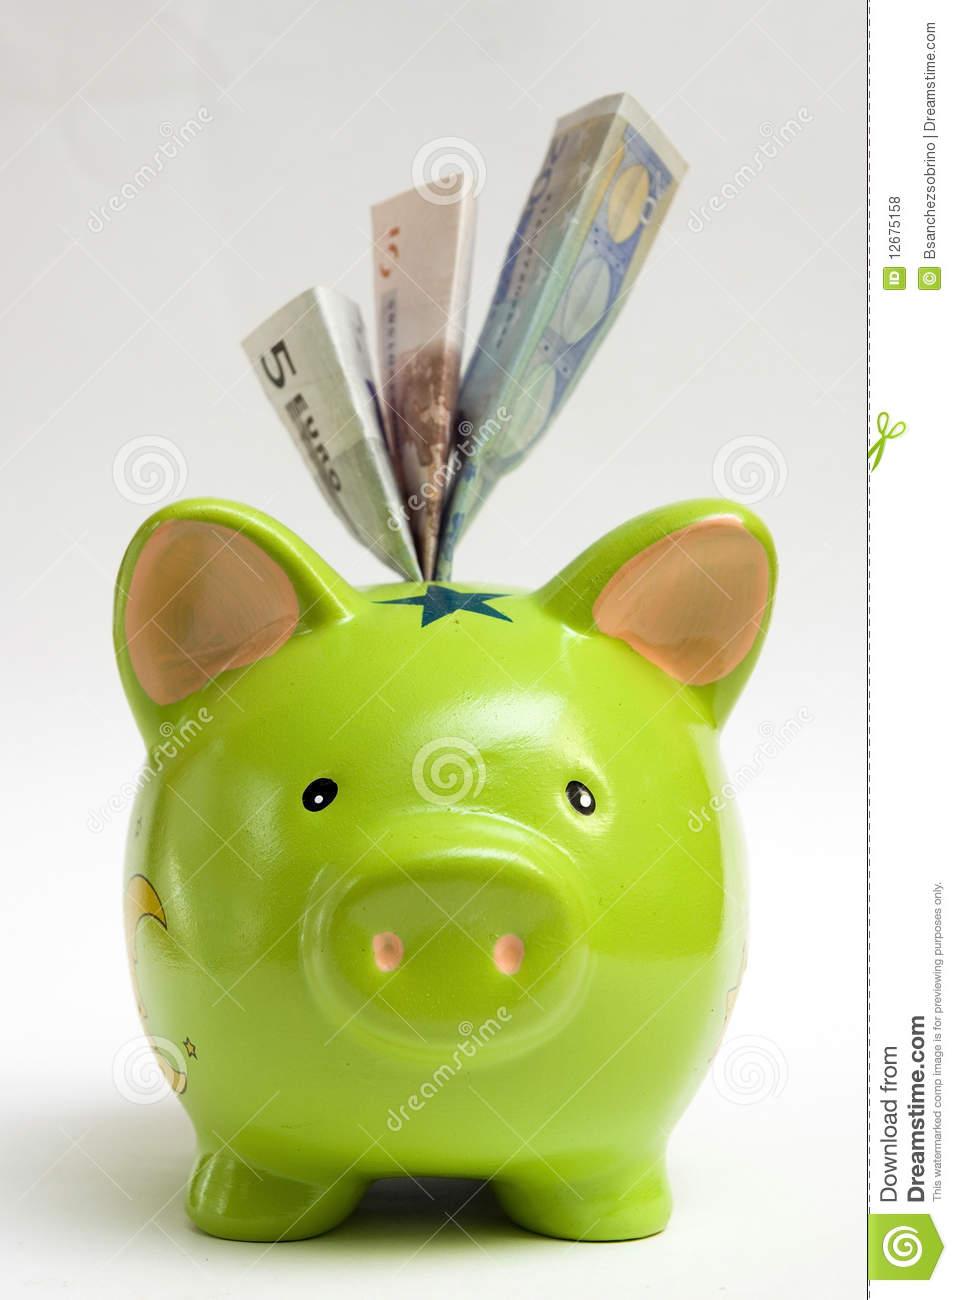 Green piggy bank clipart svg Green Piggy Bank And Money Royalty Free Stock Photos - Image: 12675158 svg